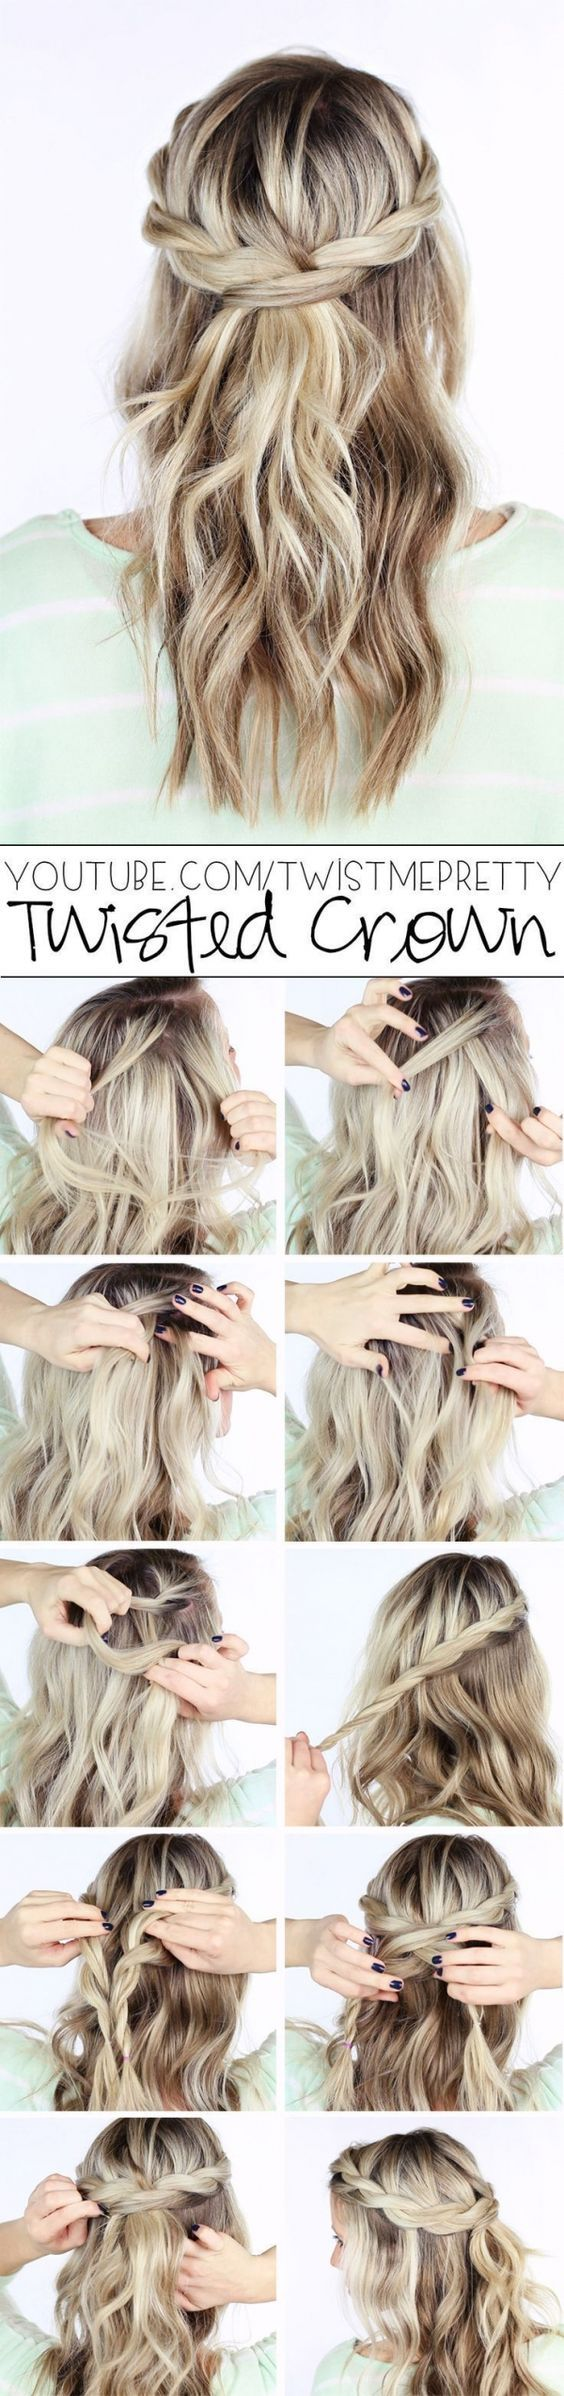 easy step by step hairstyle tutorials crown braids crown and